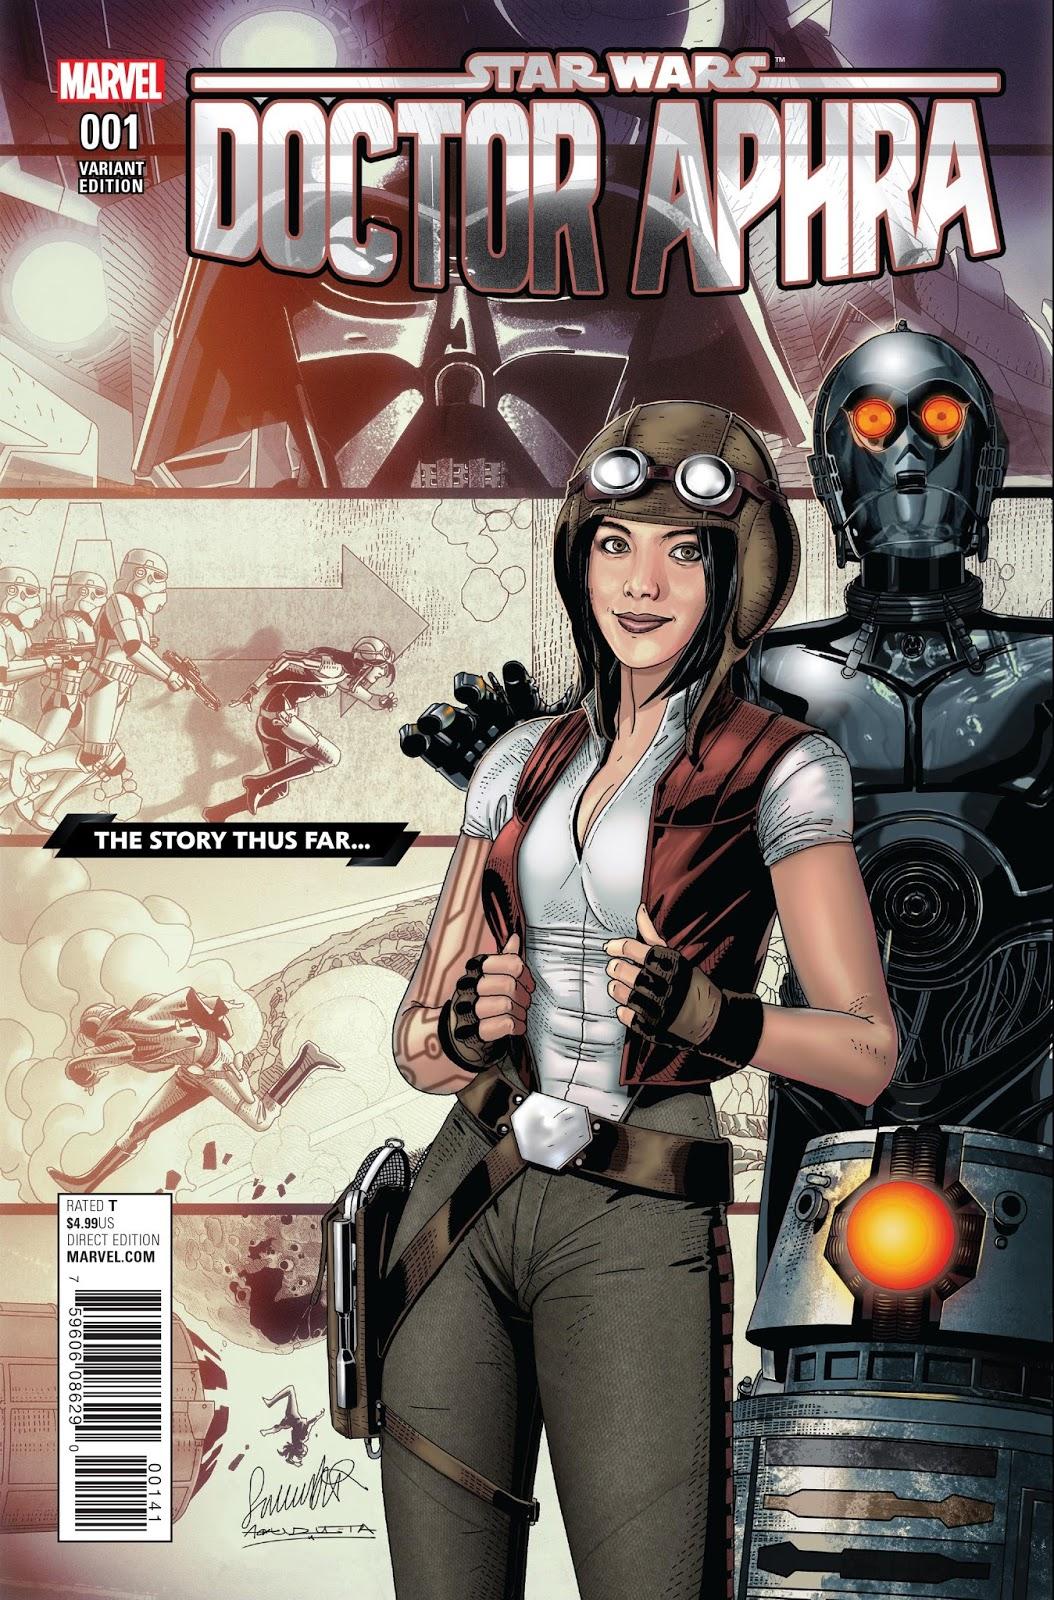 Comics: Marvel Studios Star Wars: Doctor Aphra #1 (2016) – Reviewed